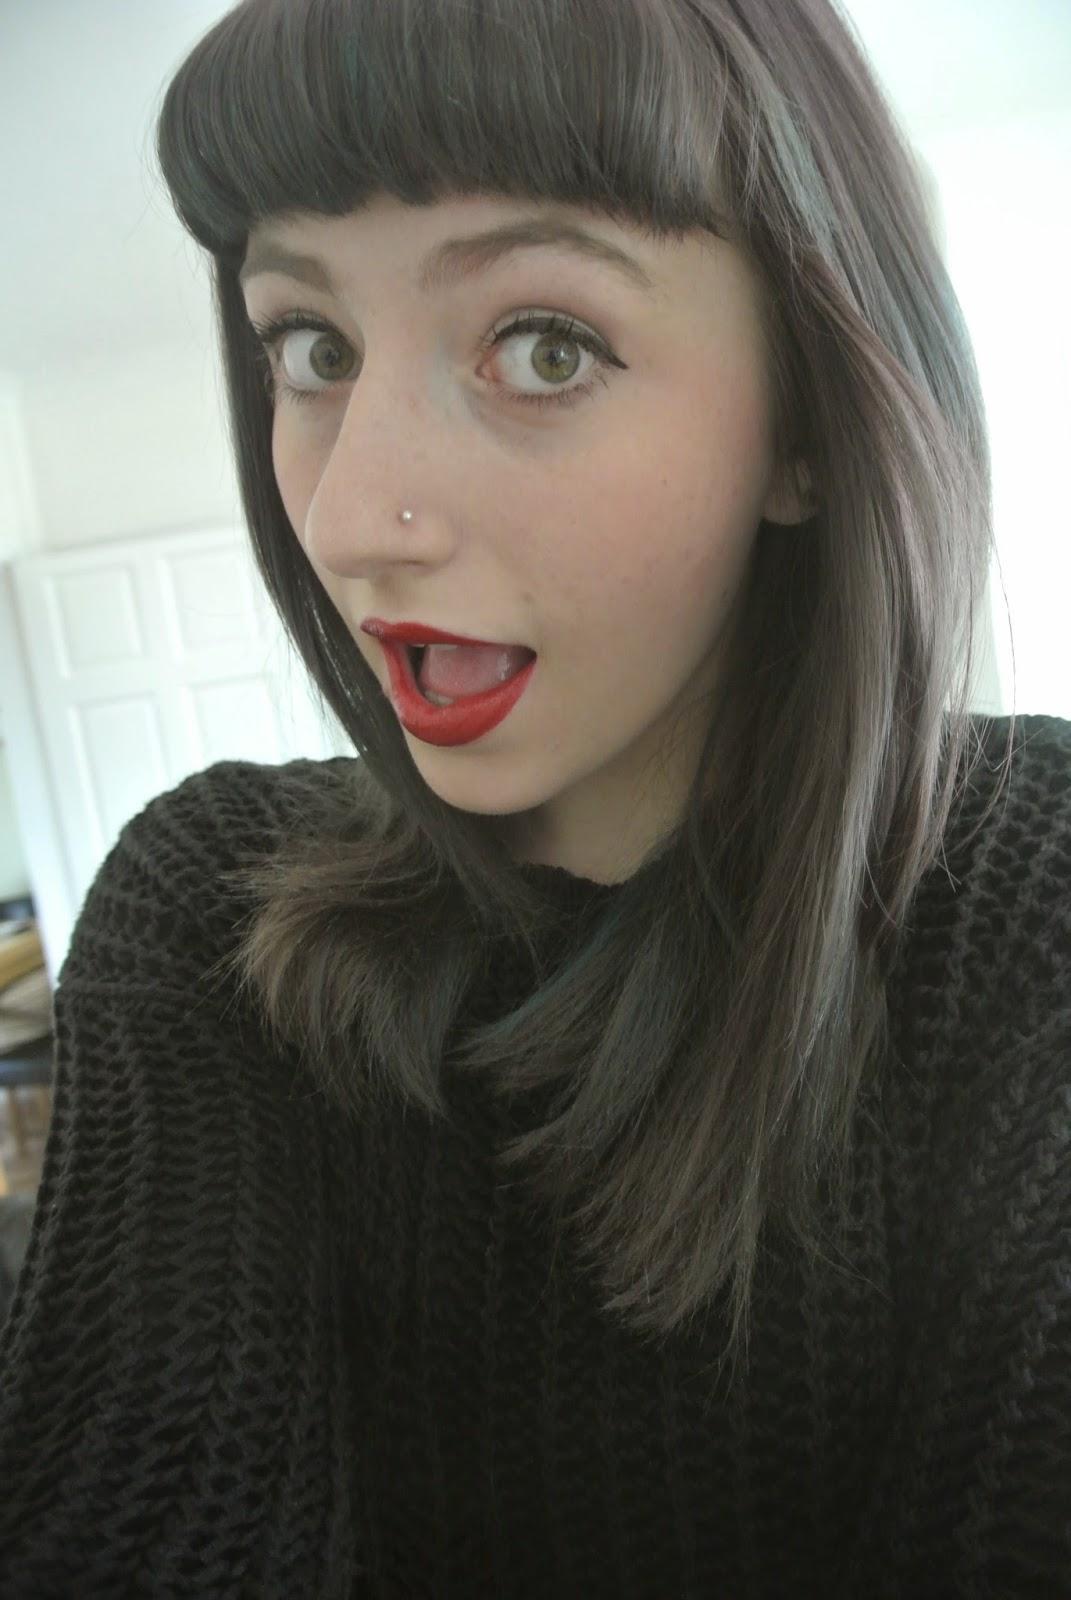 Mac Cremesheen Lipstick - Dare You